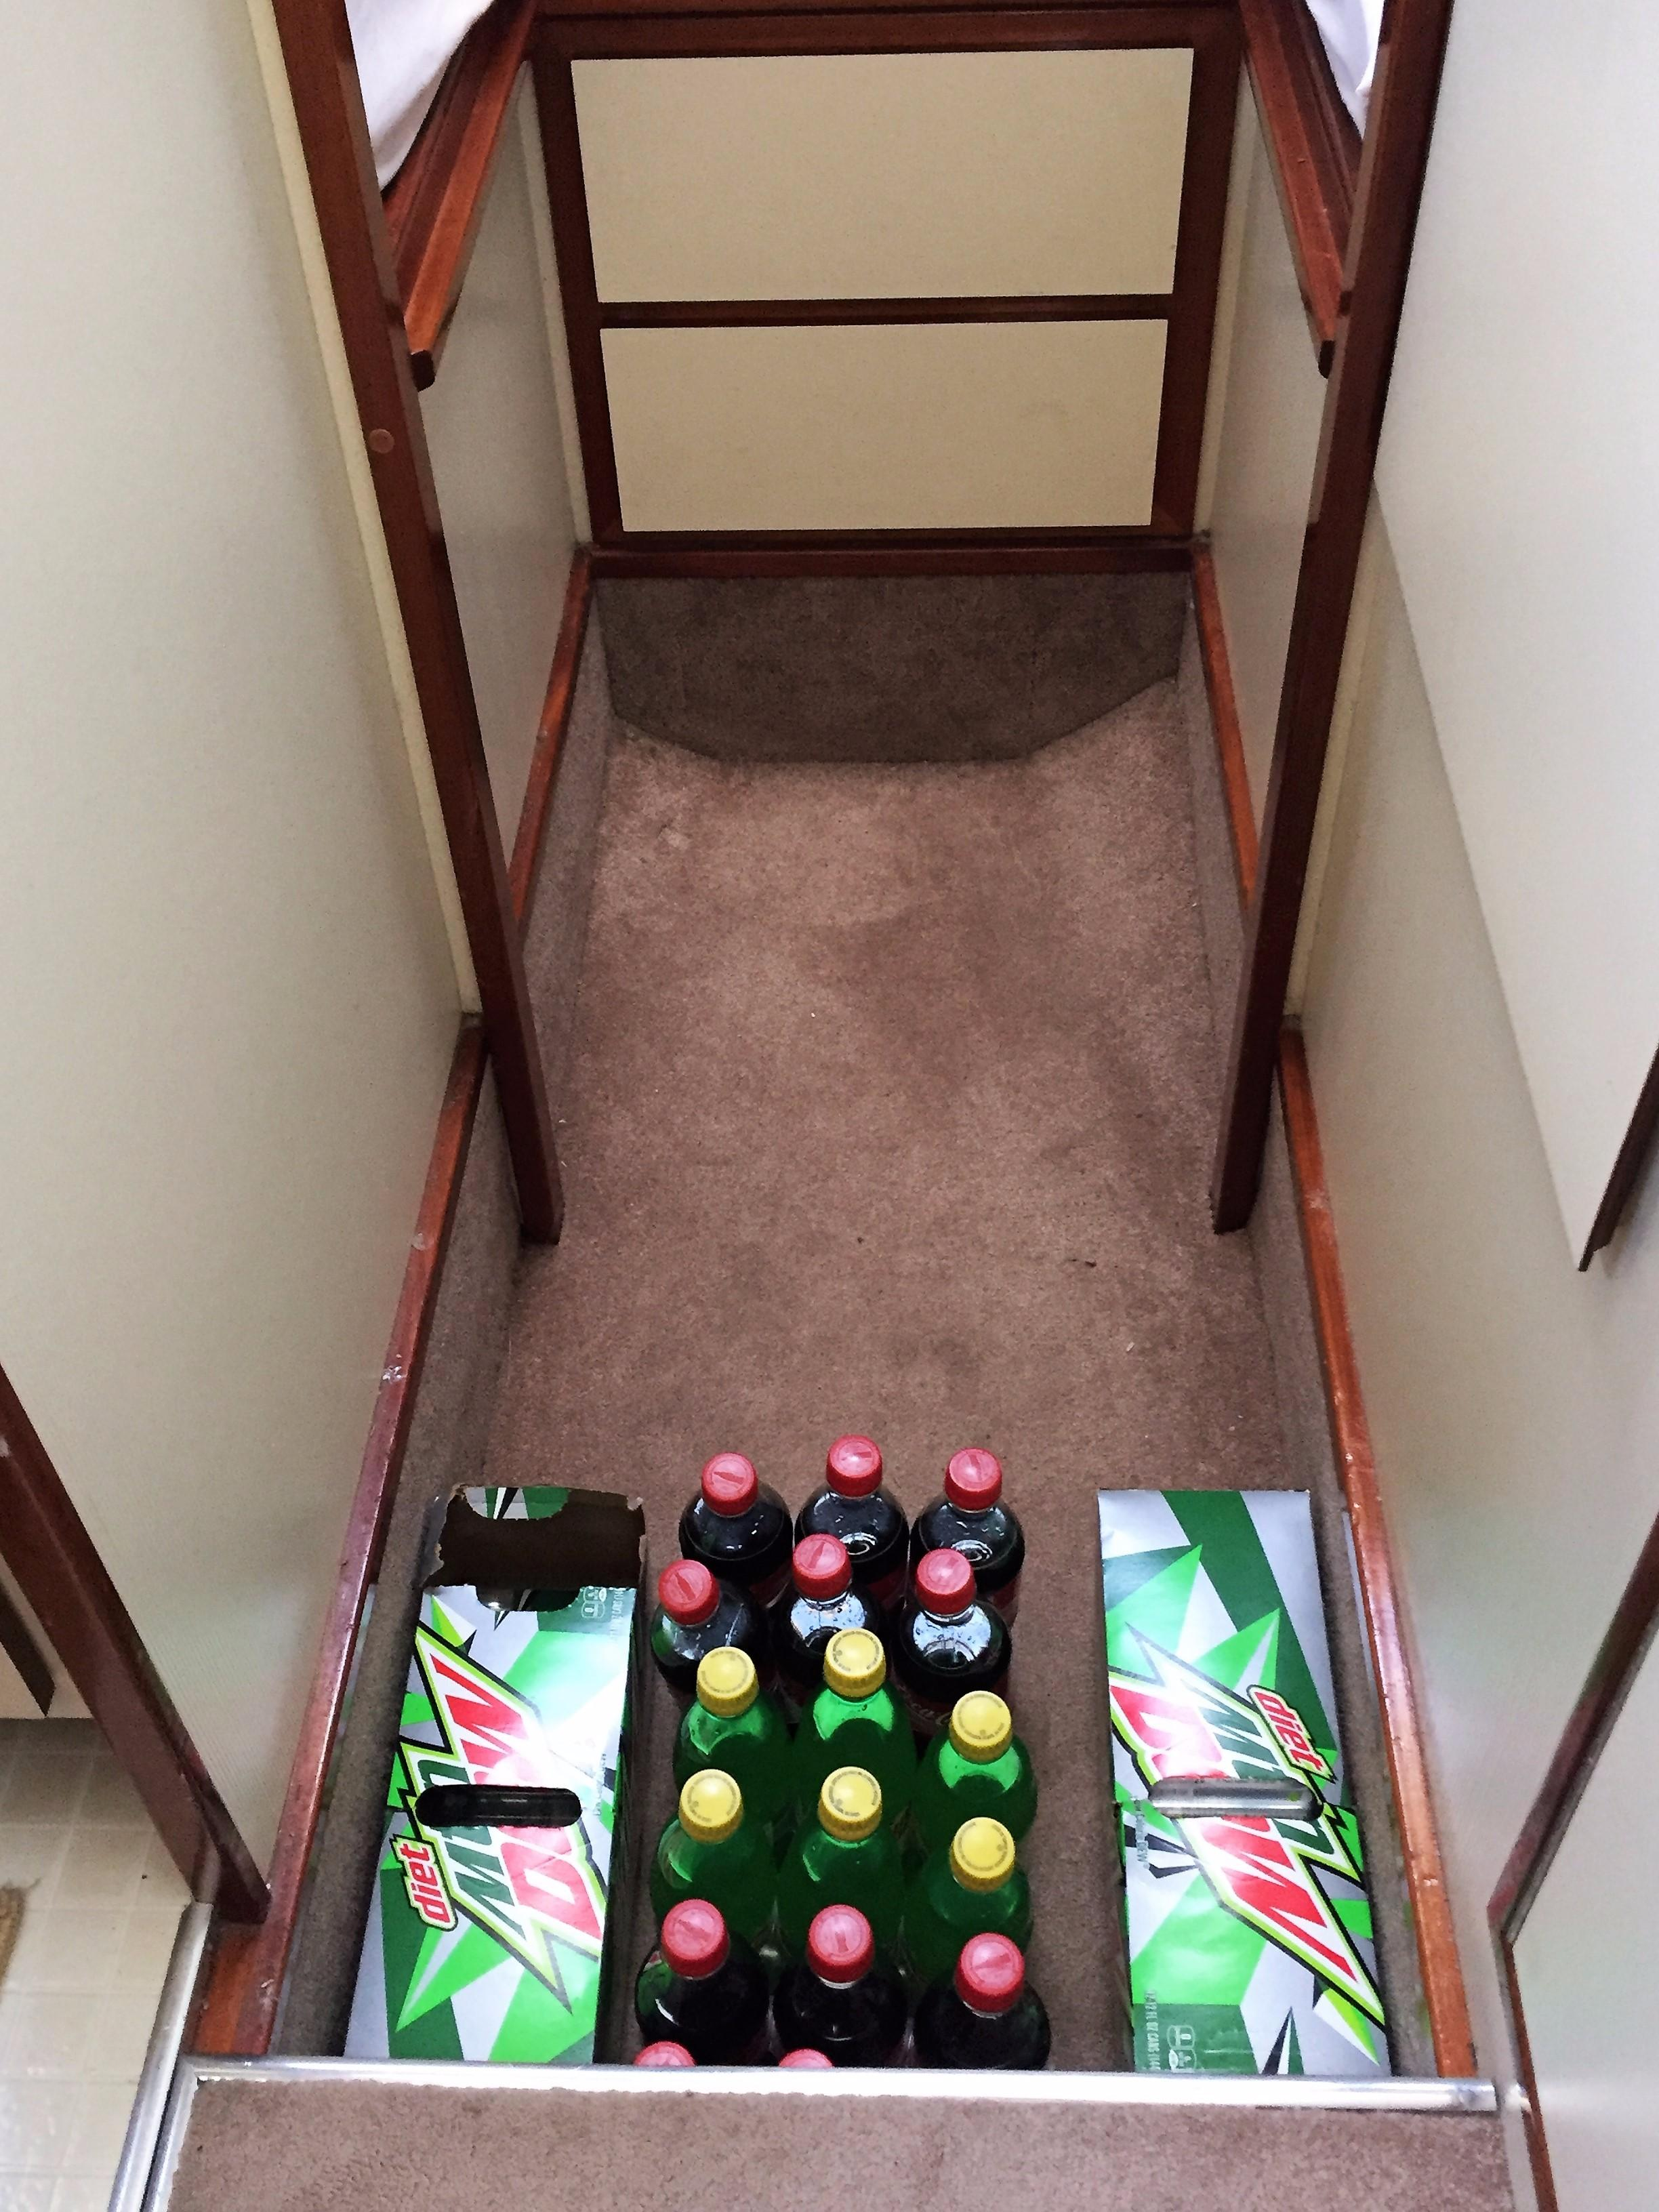 Camano Troll - under floor storage